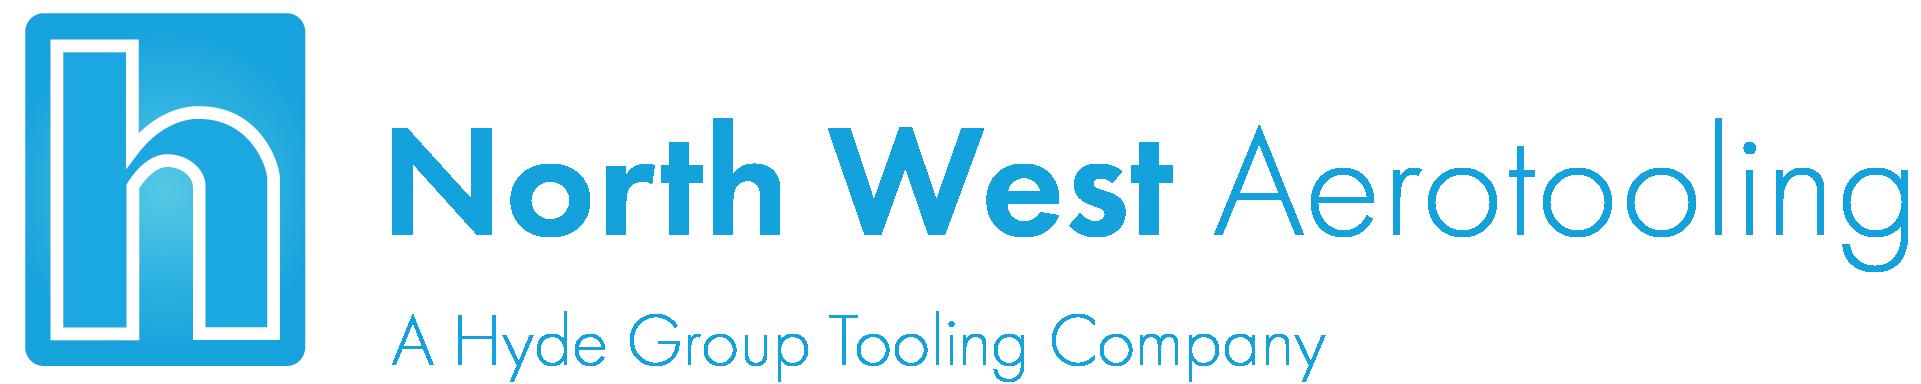 North West Aerotooling Logo.png